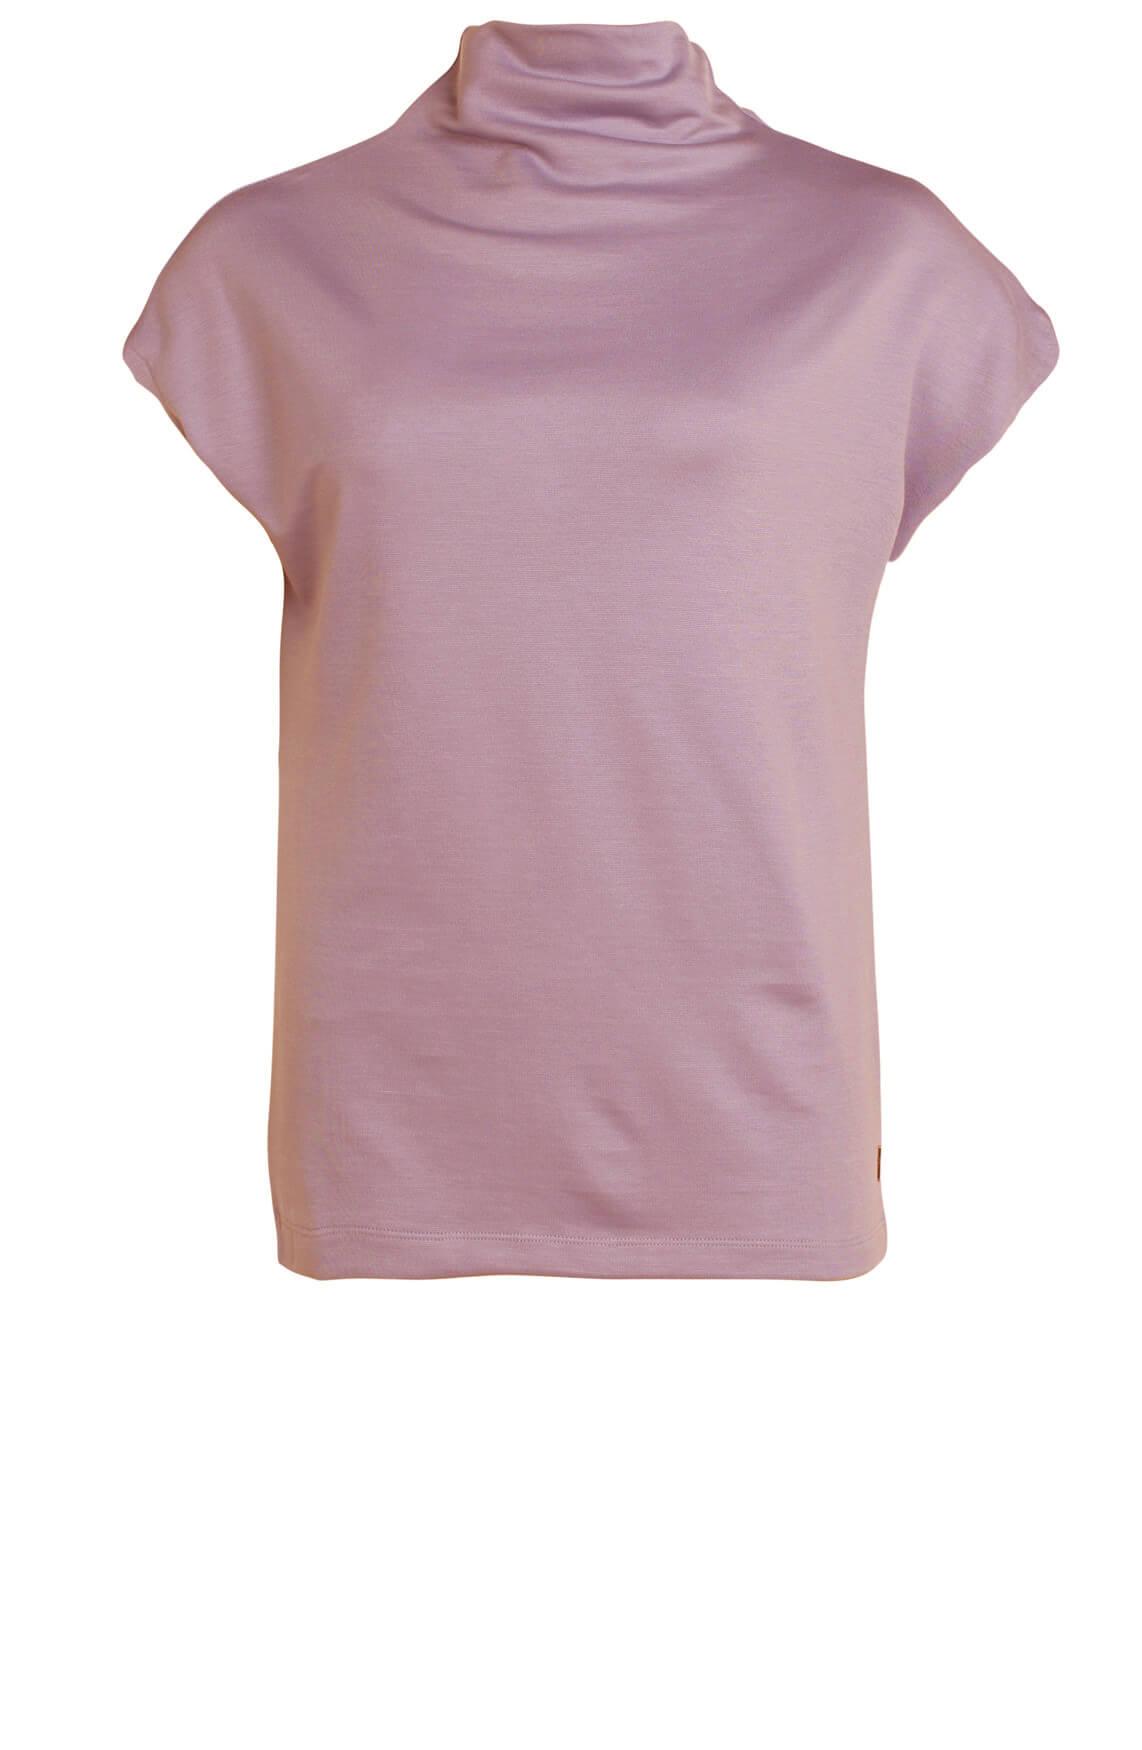 Anna Dames Shirt met col Paars